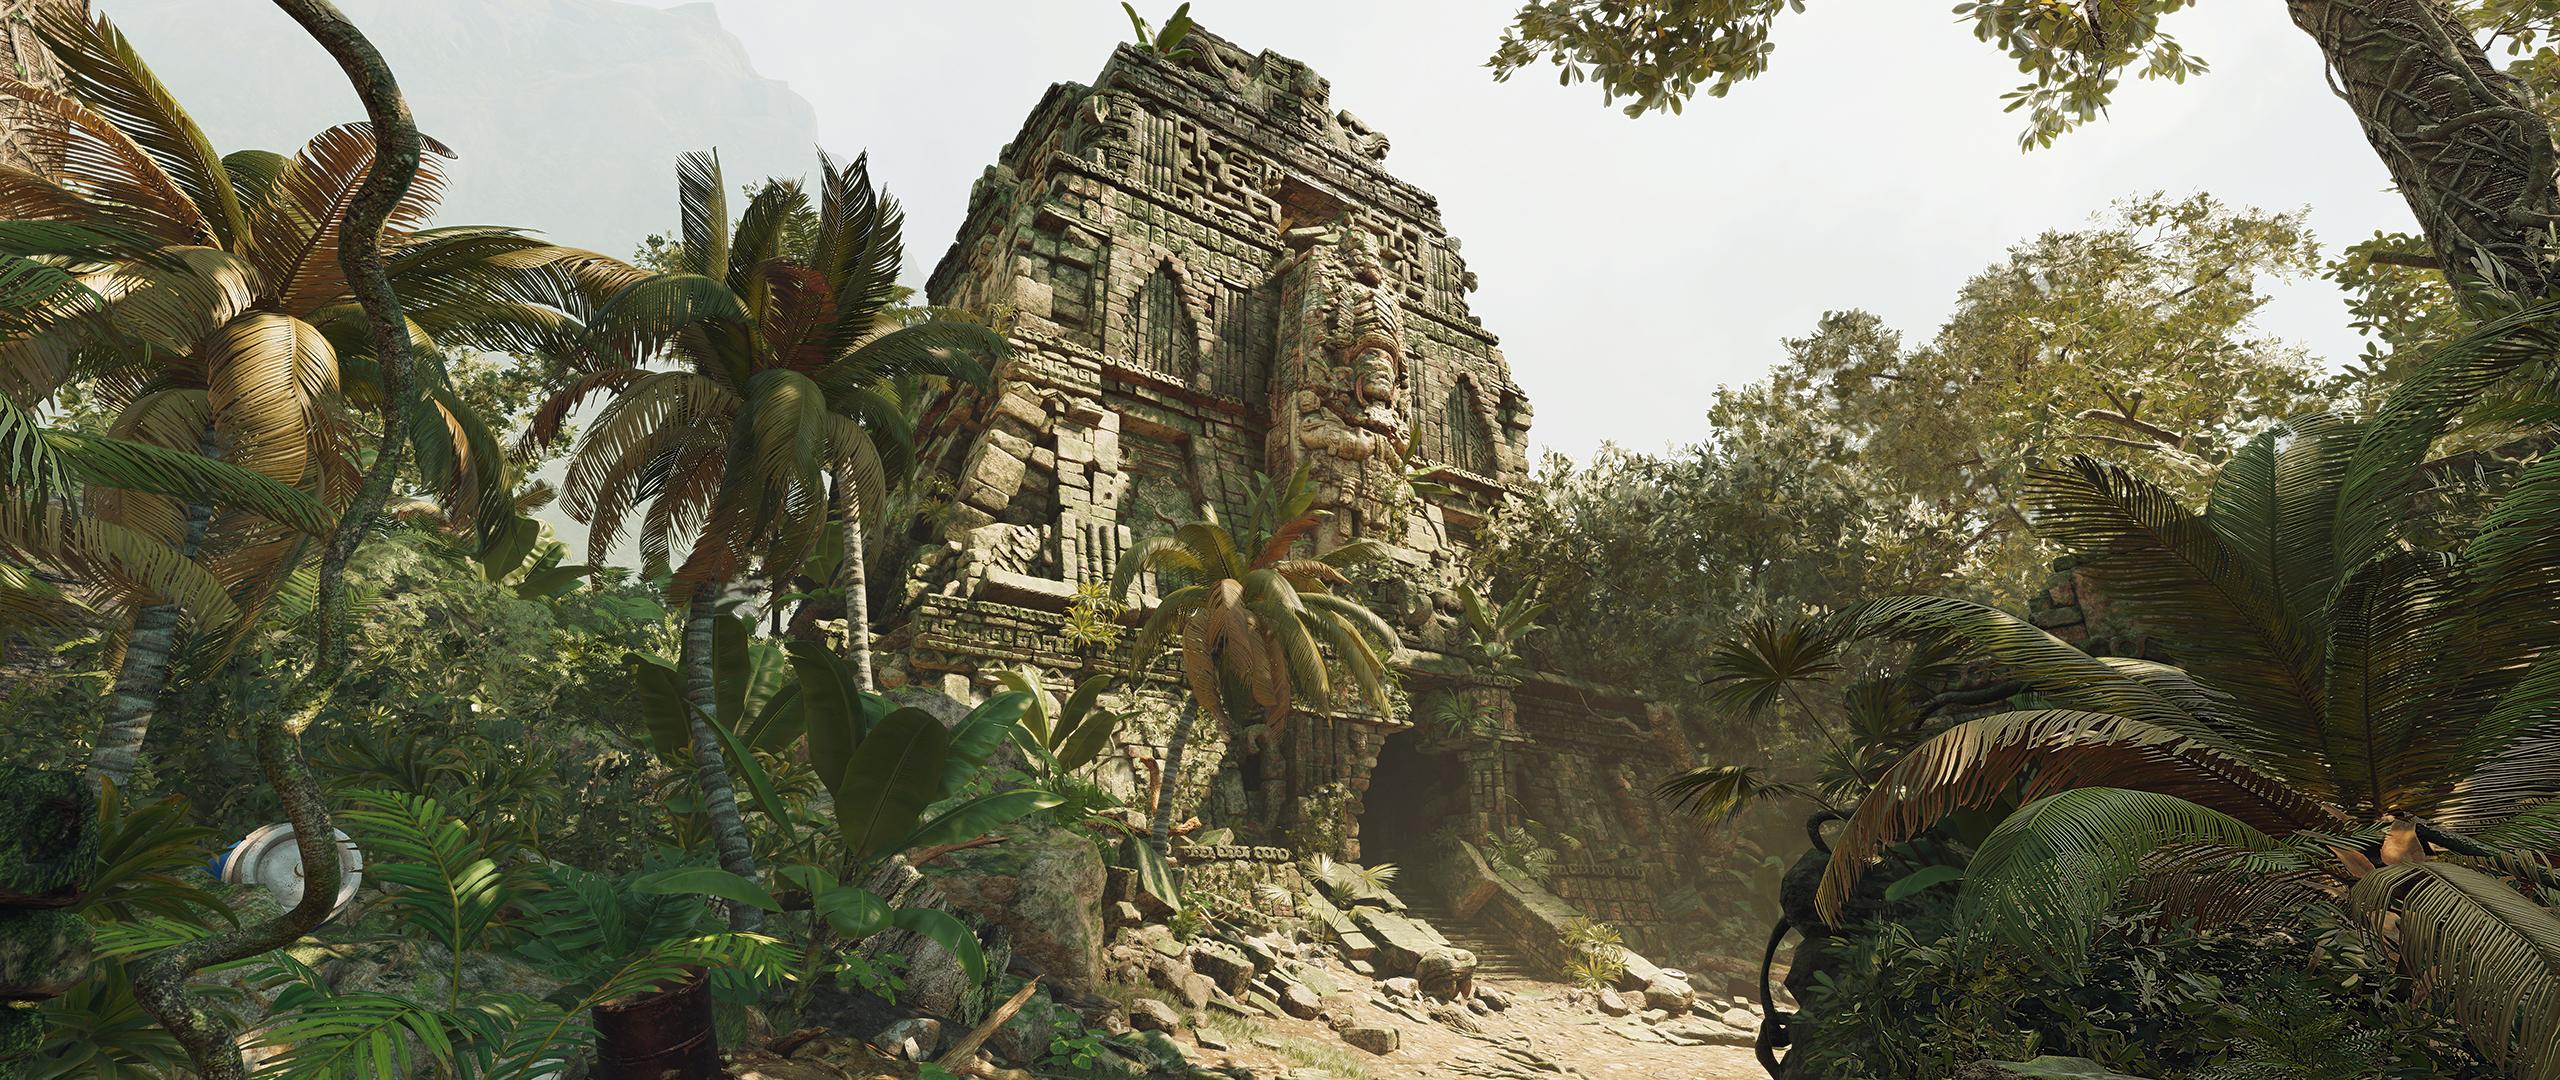 Shadow of the Tomb Raider Super-Resolution 2018.11.22 - 08.50.35.66.jpg - Shadow of the Tomb Raider